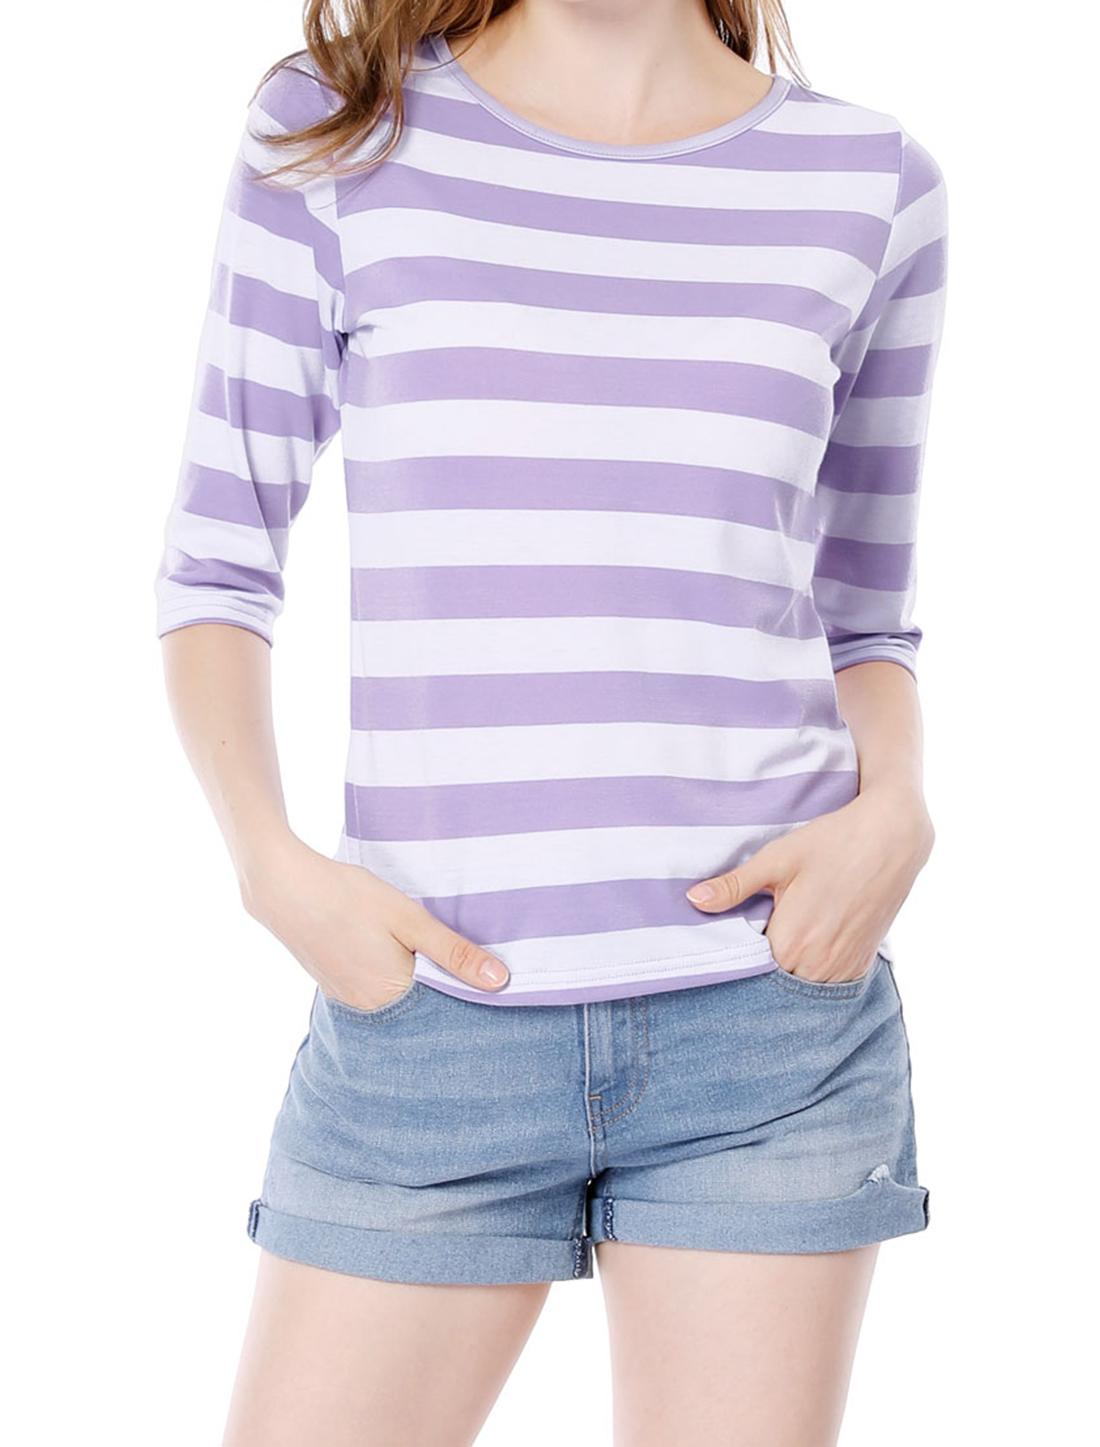 Allegra K Women Elbow Sleeve Contrast Color Printed Tee Light Purple S